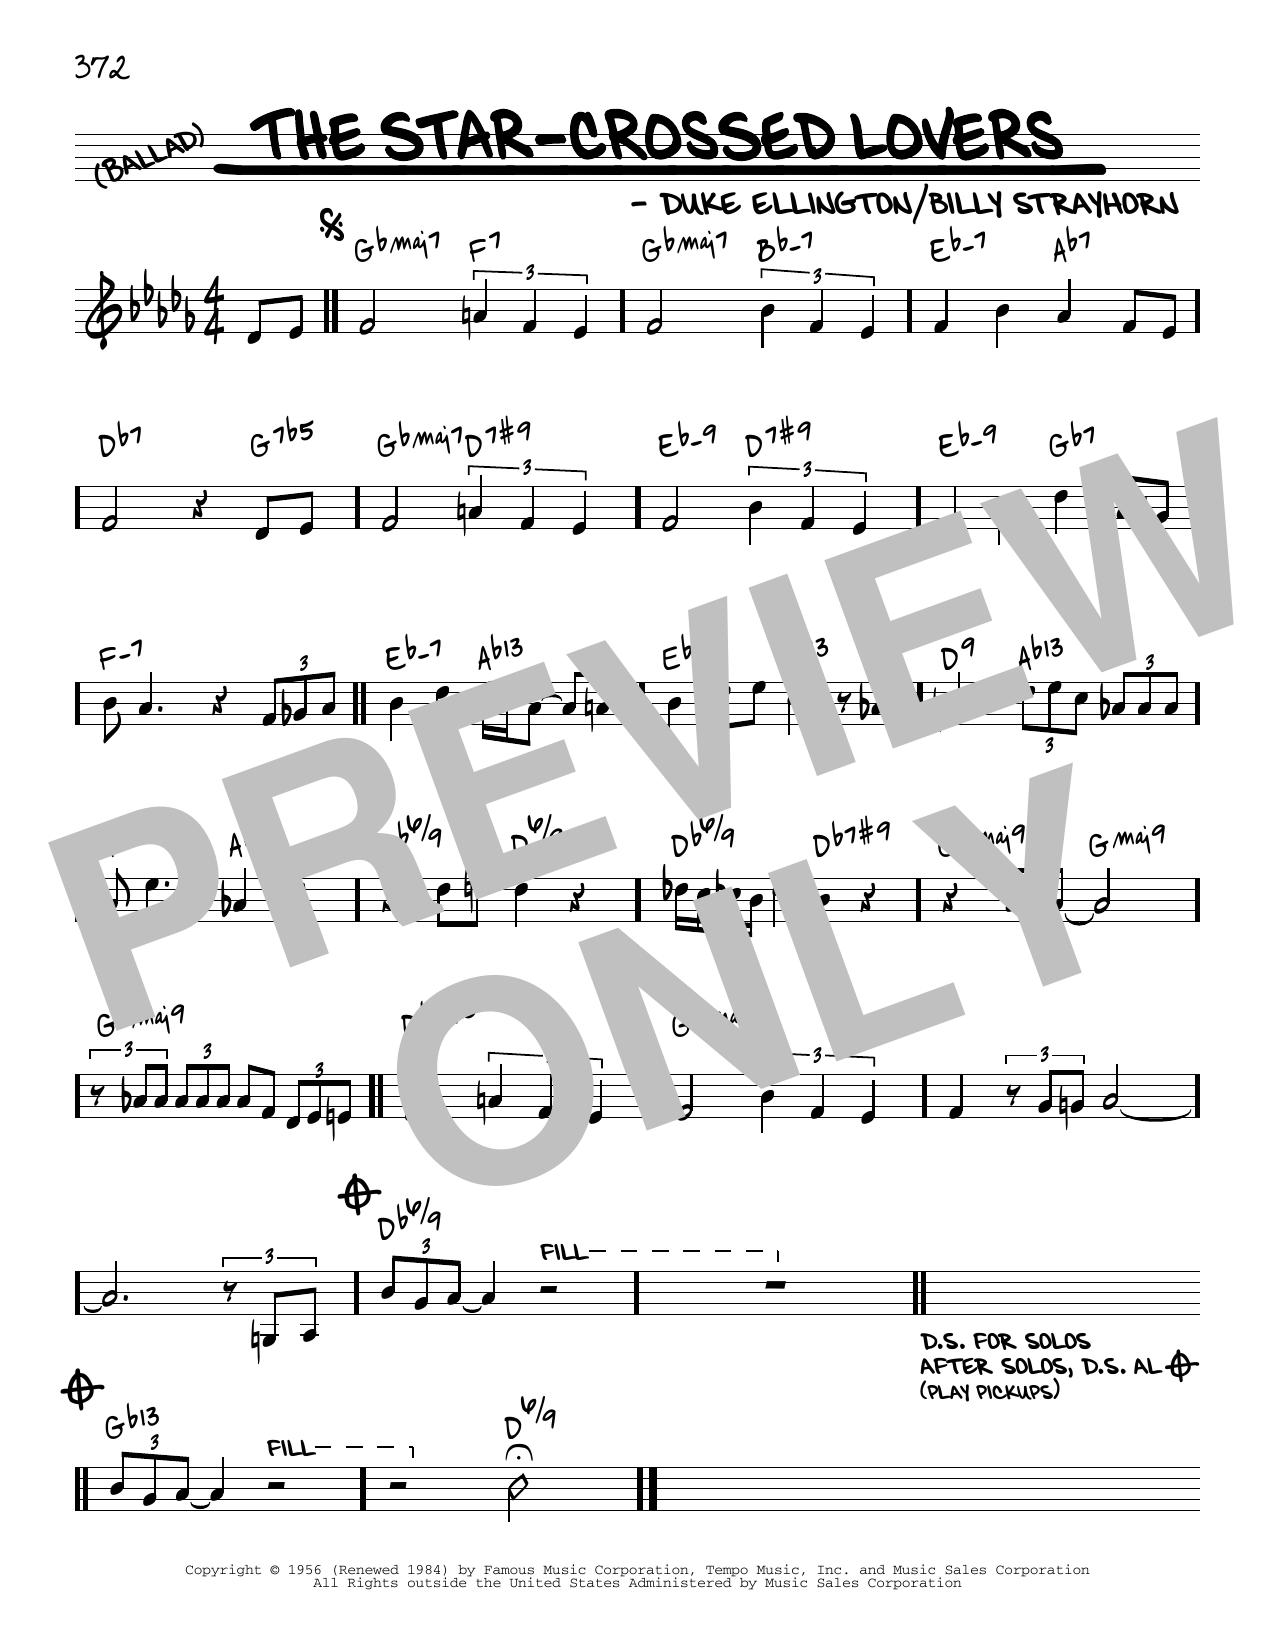 Duke Ellington The Star-Crossed Lovers [Reharmonized version] (arr. Jack Grassel) sheet music notes printable PDF score